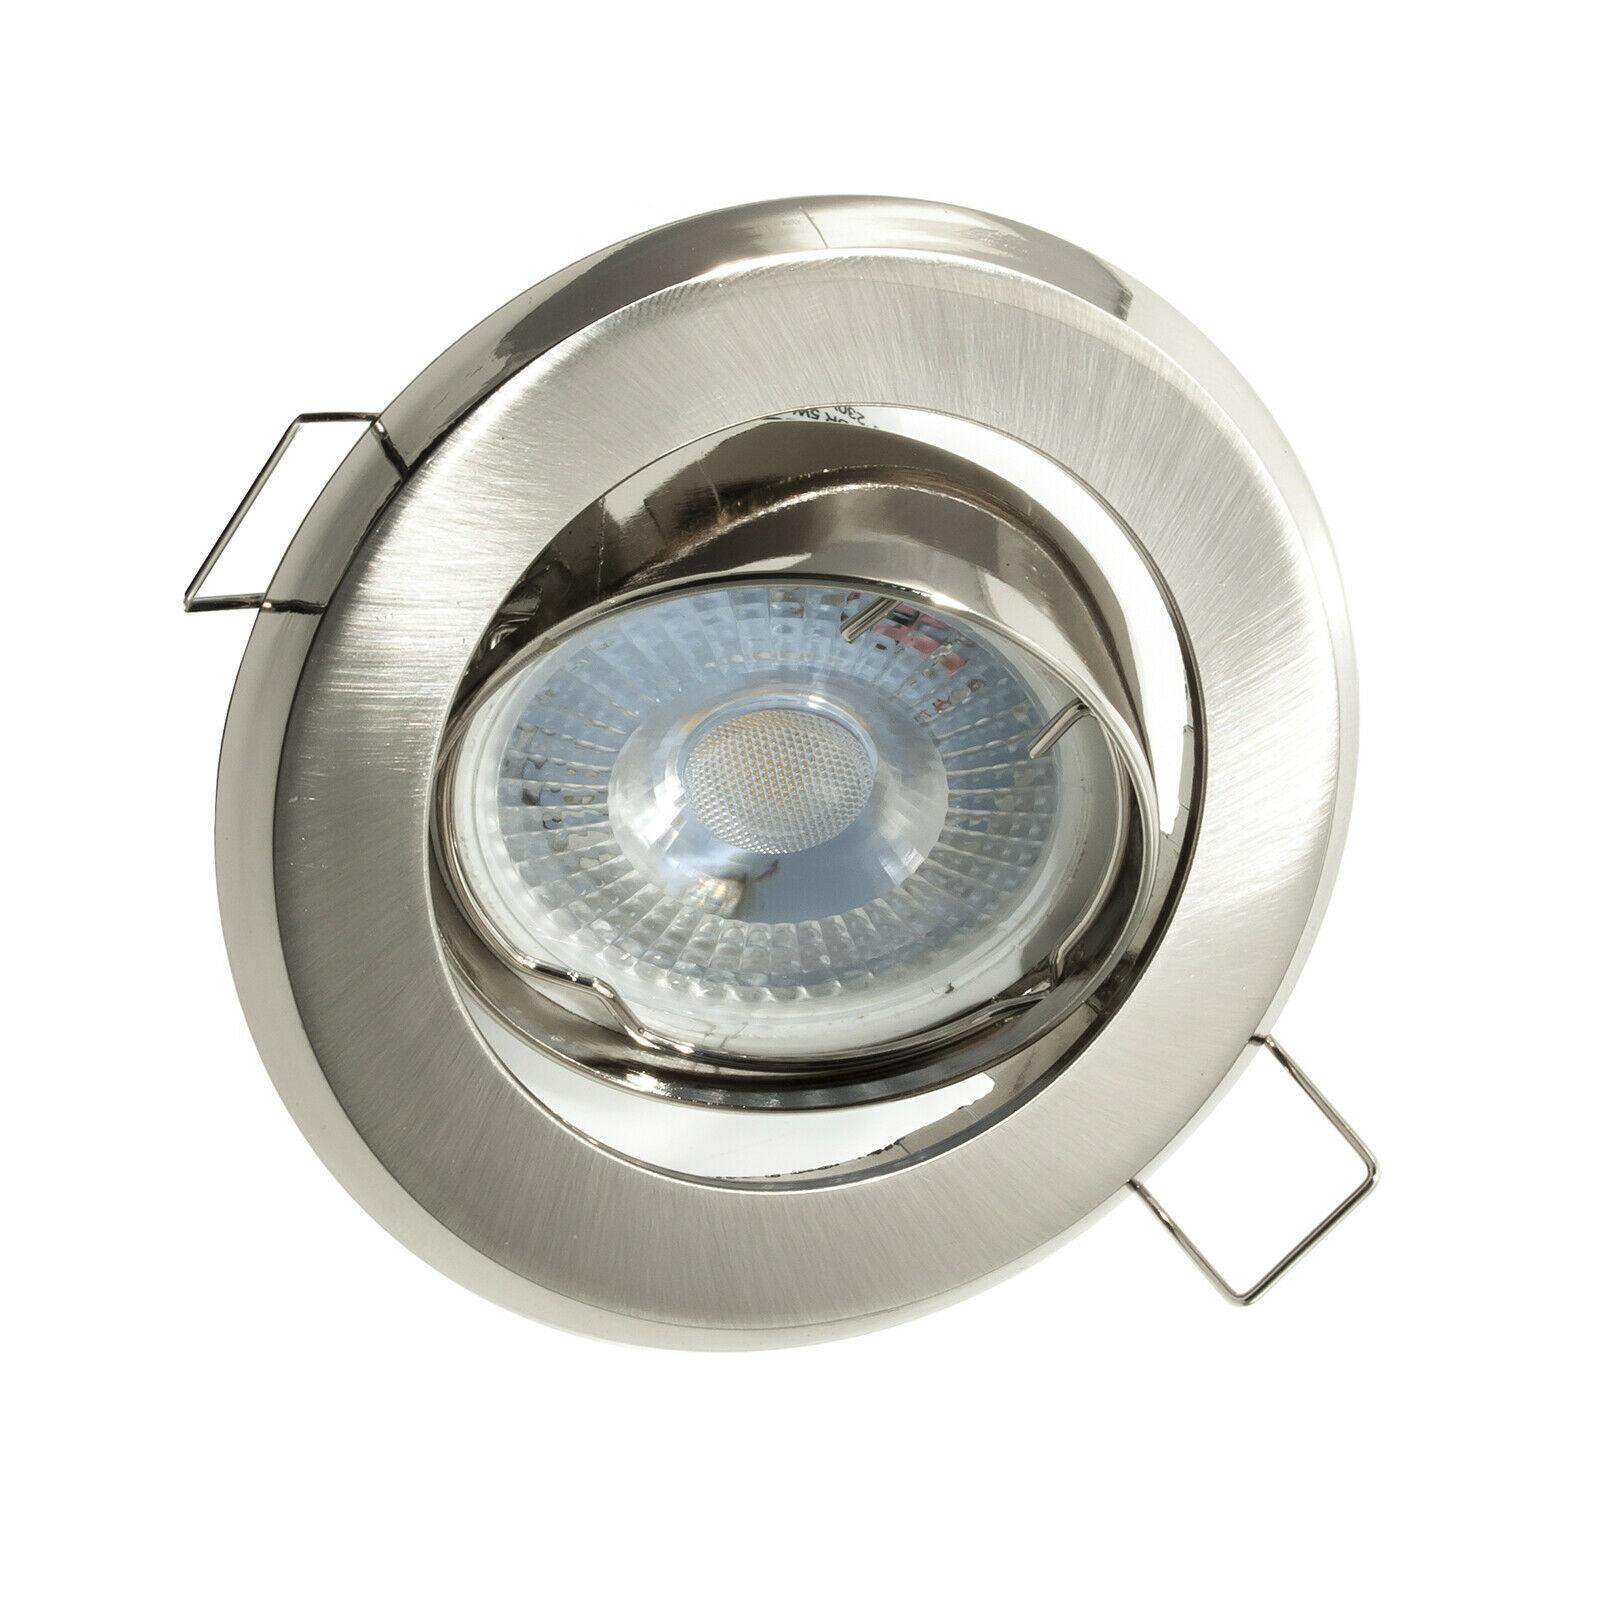 10x 1x3w MINI FARETTO LED INCASSO 30° BIANCO CALDO 3w 220v 230v ORIENTABILE D3E1